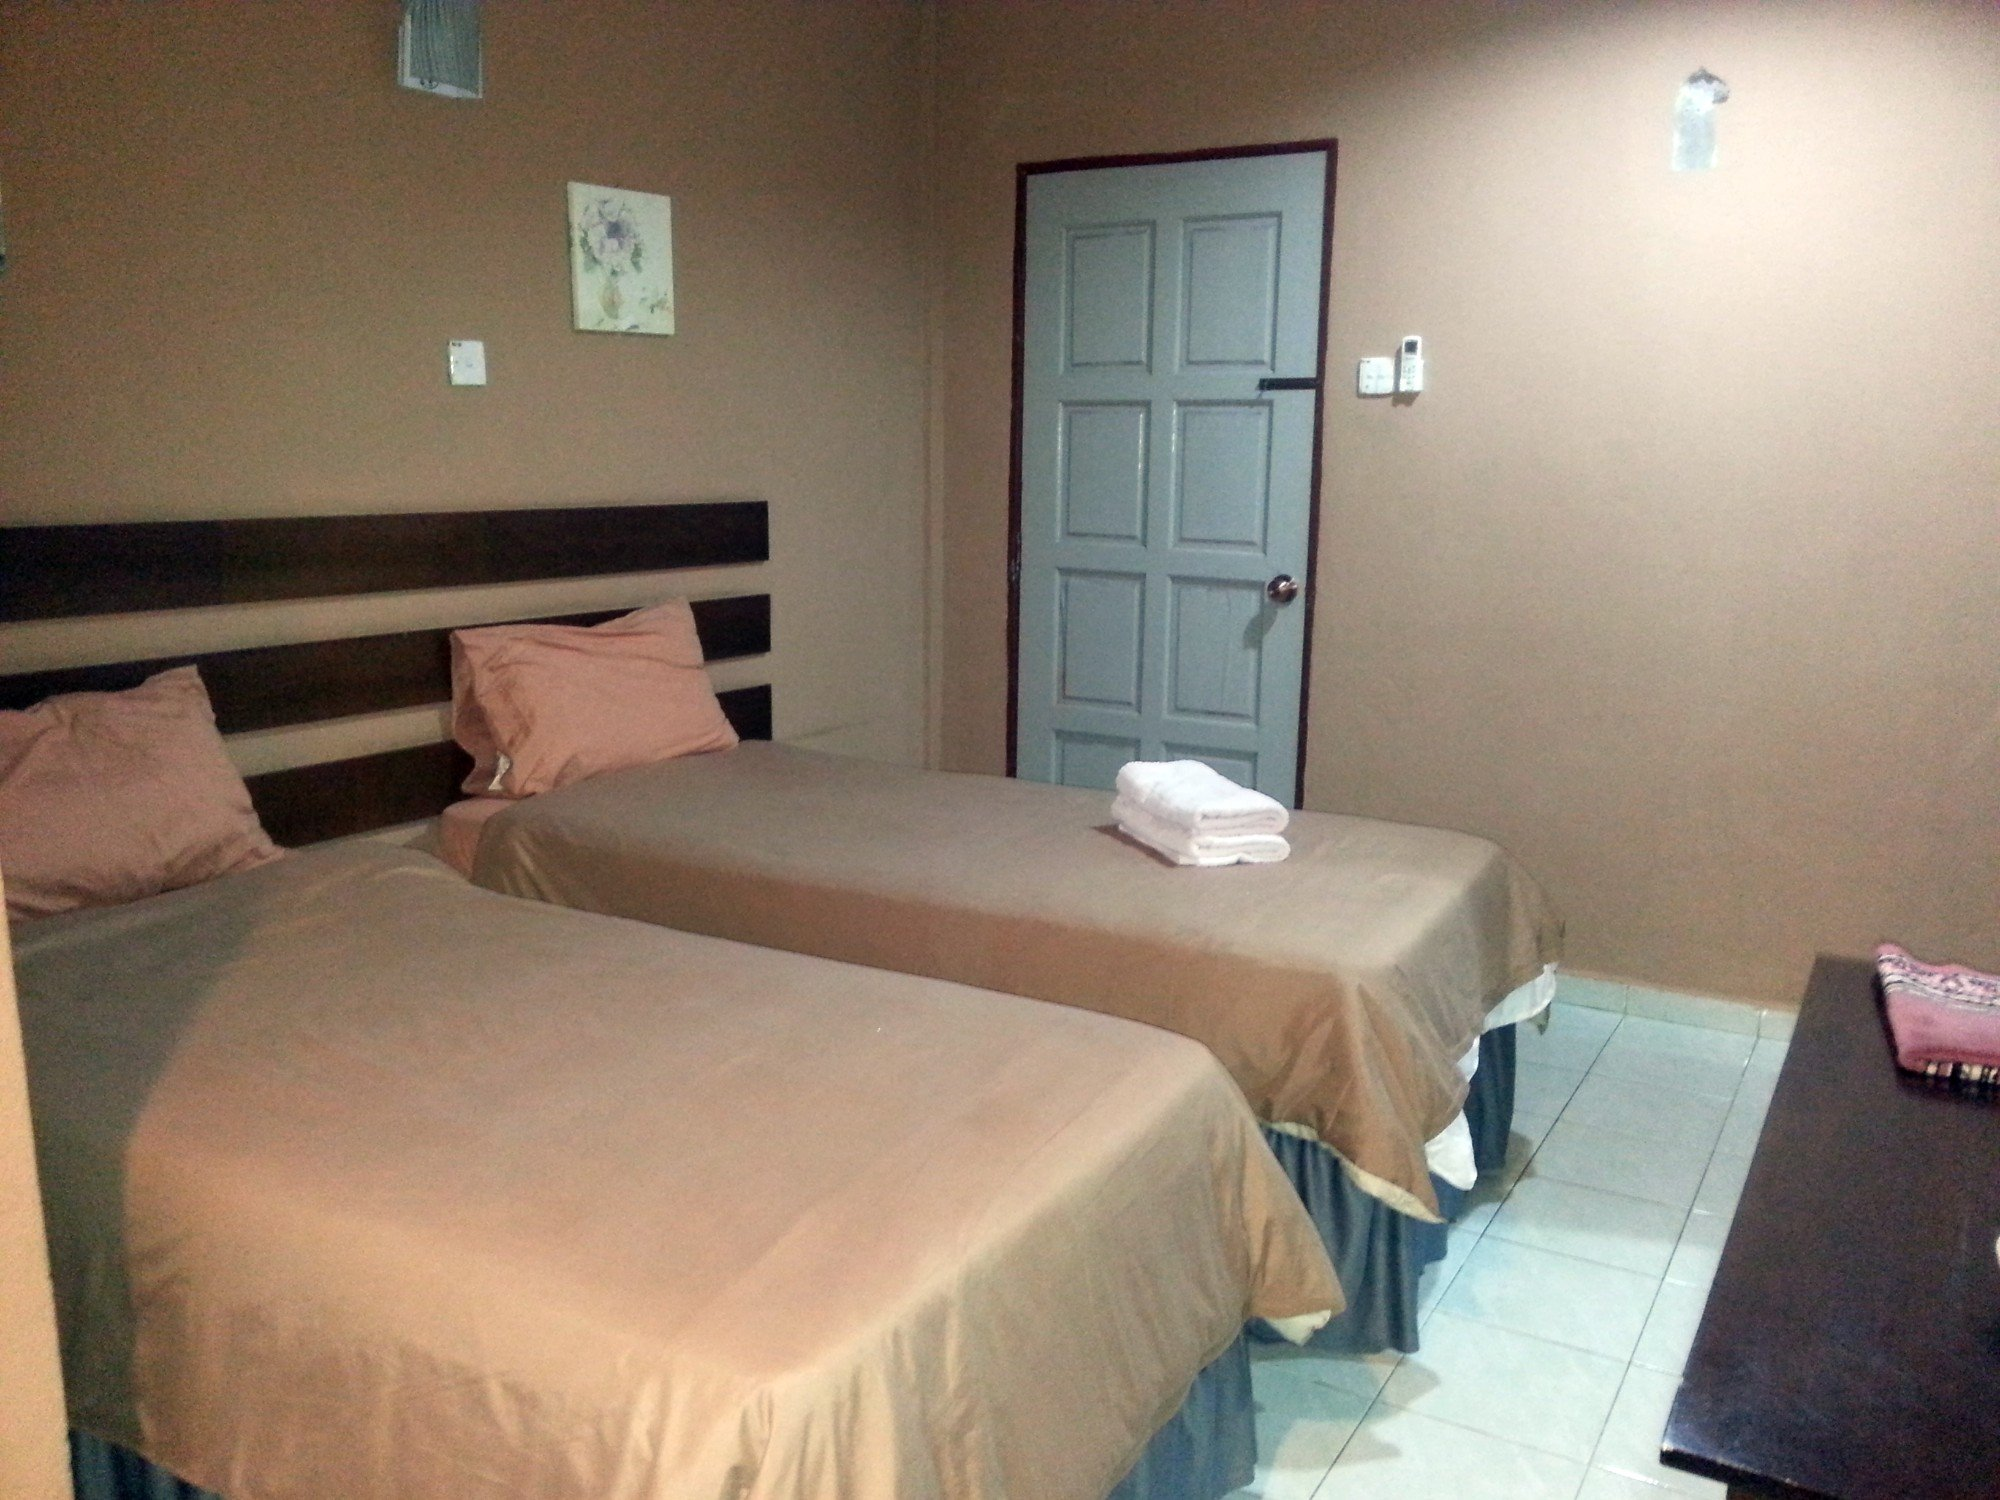 Bedroom at the Motel Sei Mutiara